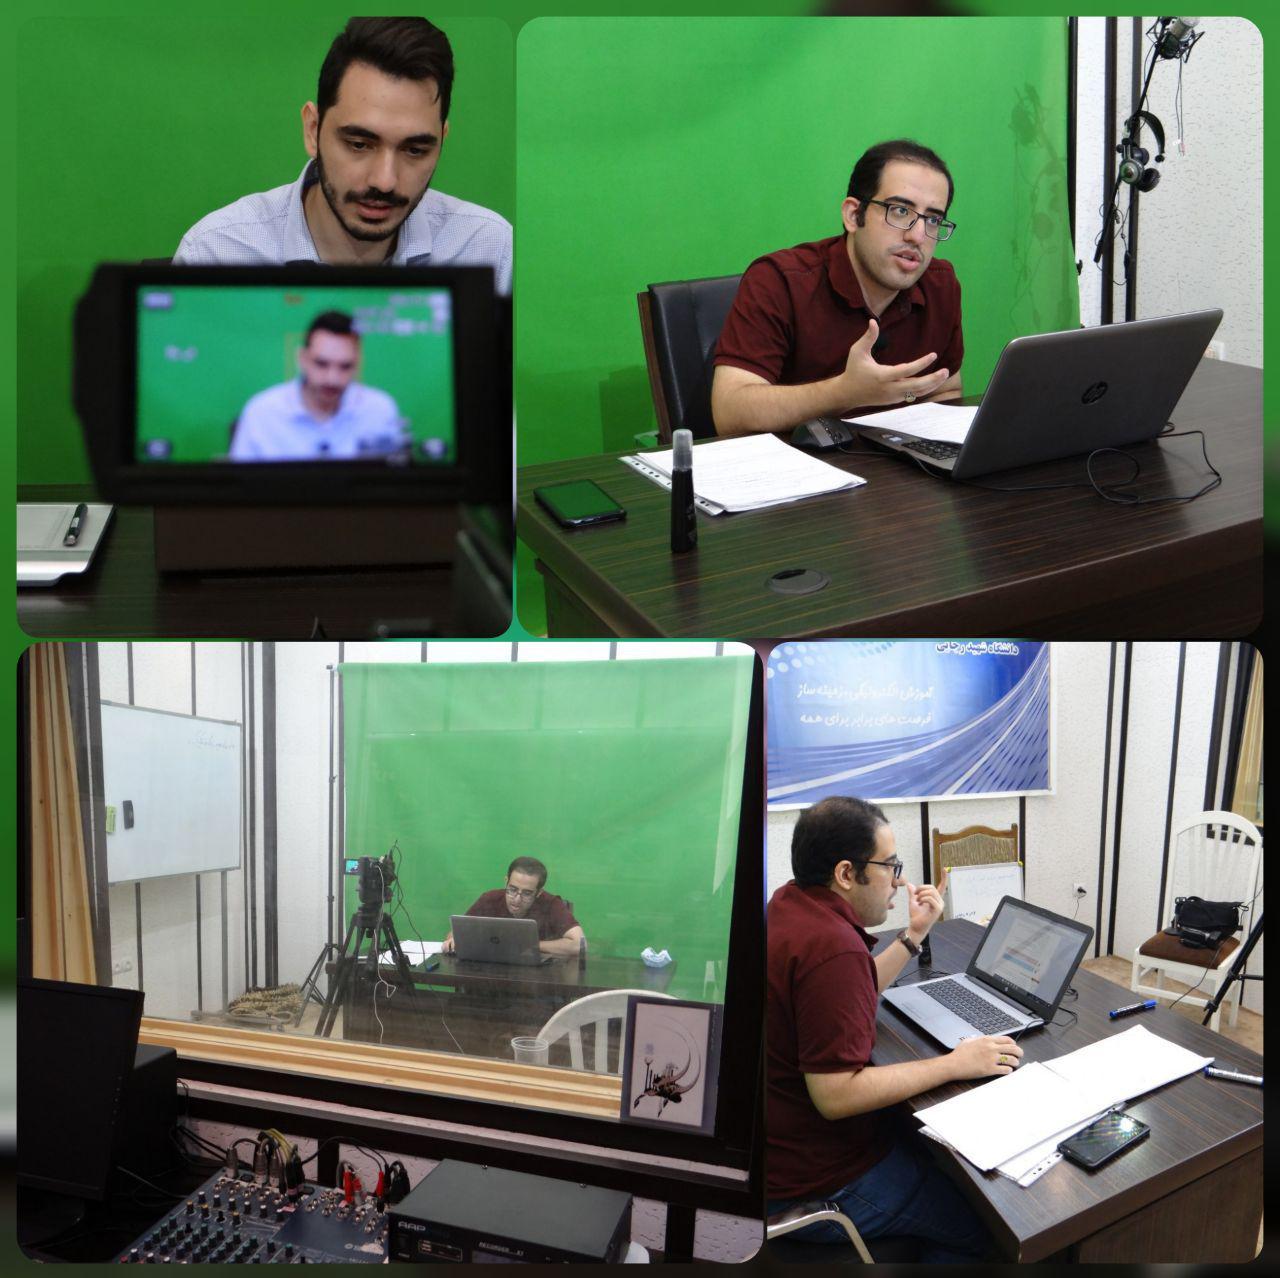 13990527000312 Test NewPhotoFree - اجرای طرح ملی «تدریس جهادی» در ایام شیوع کرونا از سوی بسیج دانشگاه شهید رجائی